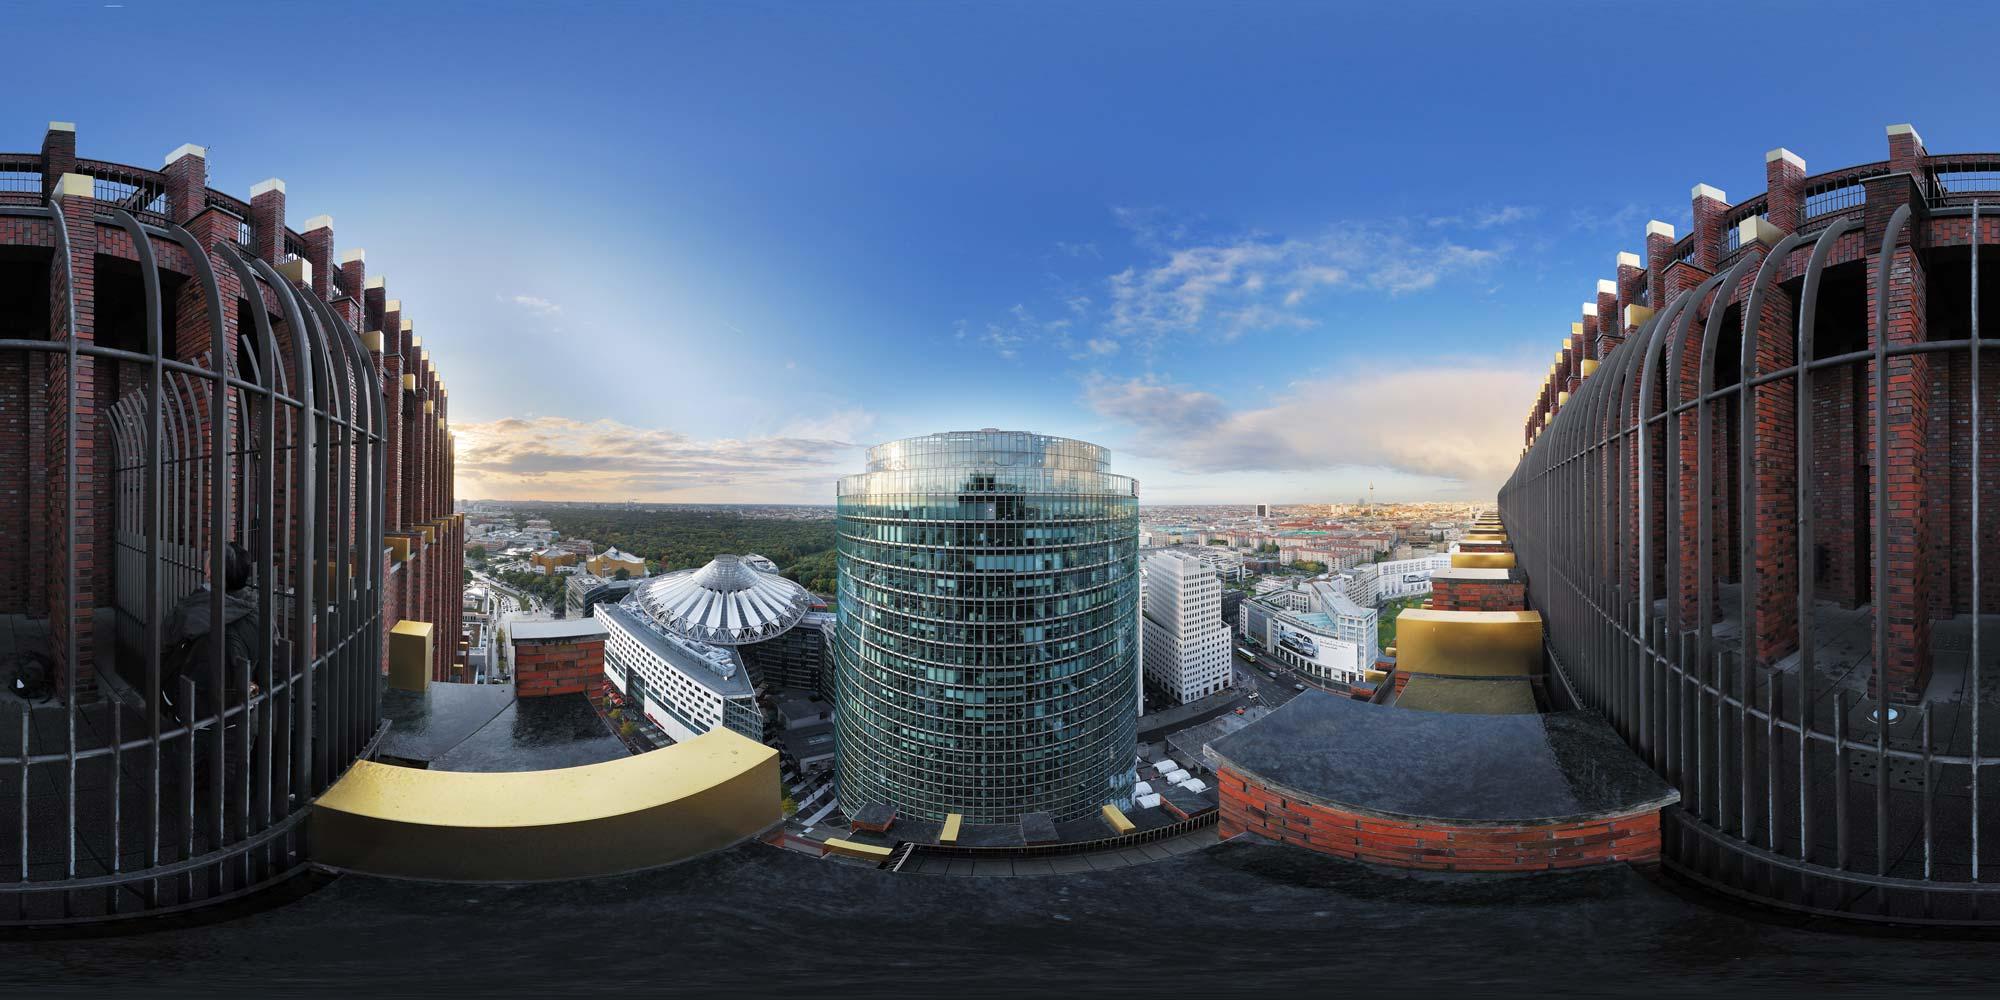 kubische panoramen panorama foto potsdamer platz areal blick auf das sony center. Black Bedroom Furniture Sets. Home Design Ideas